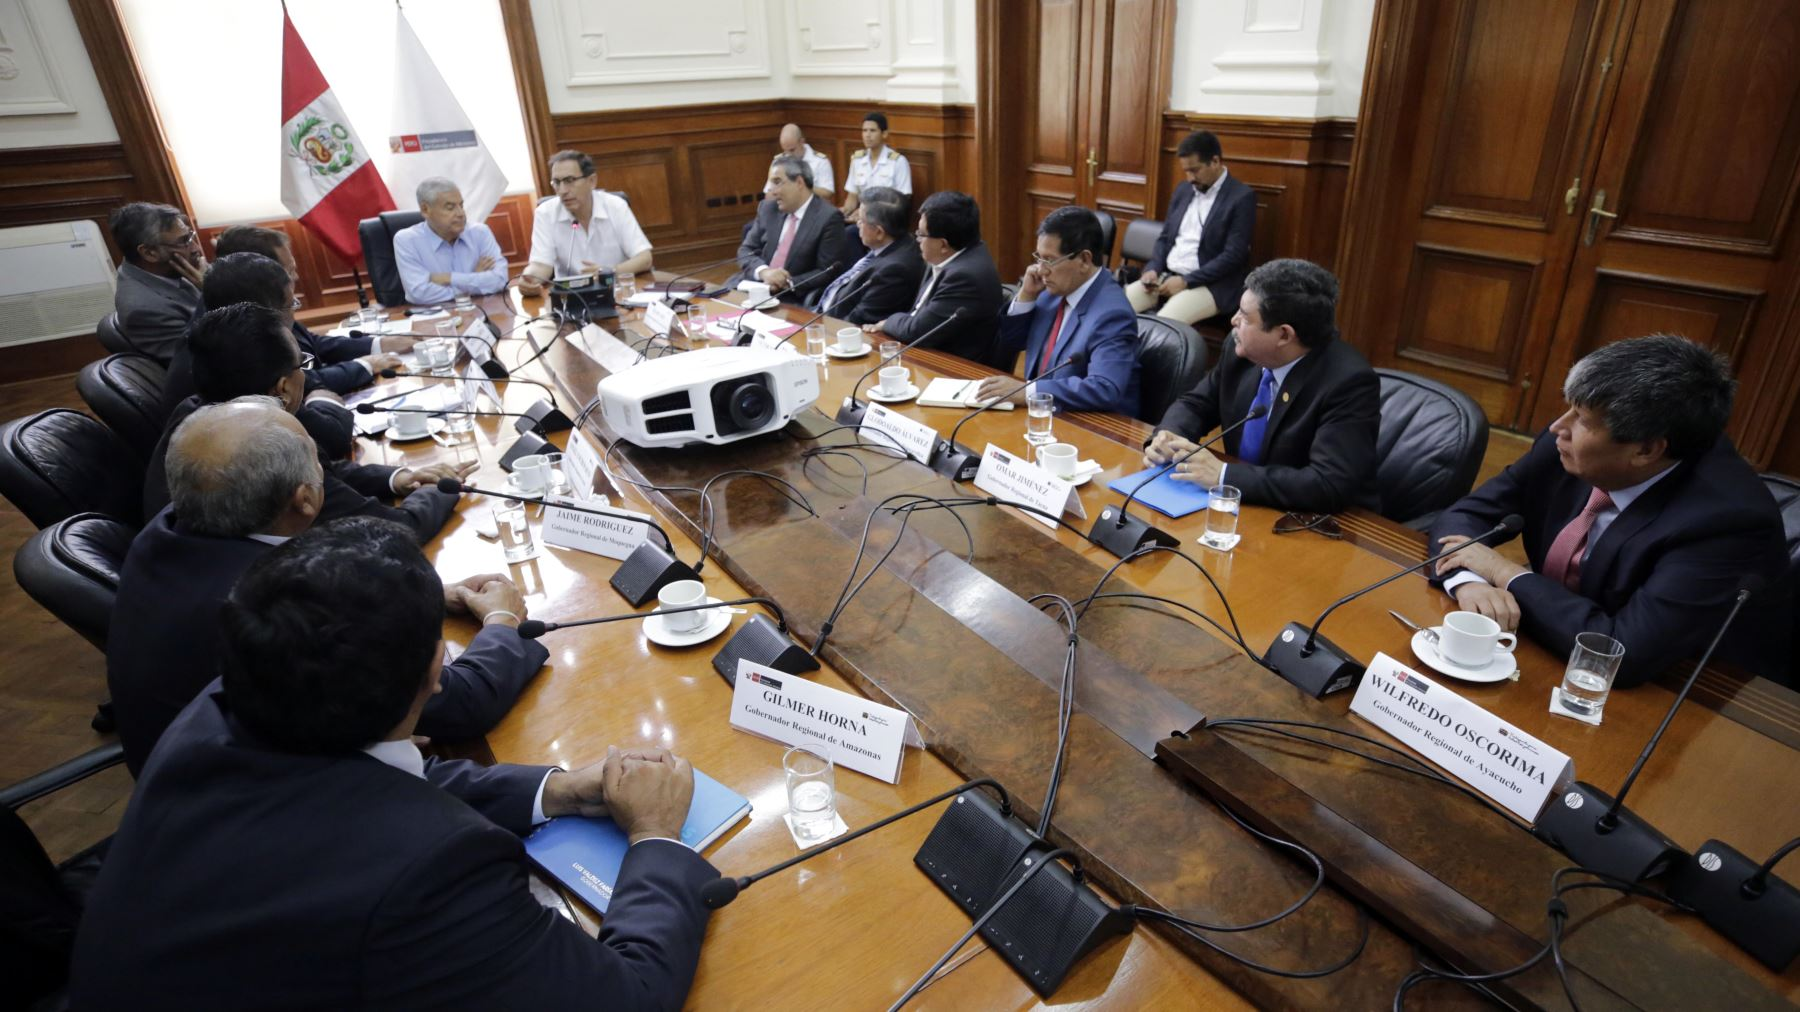 Alcalde de Puno resalta profesionalismo de César Villanueva. ANDINA/Prensa Presidencia